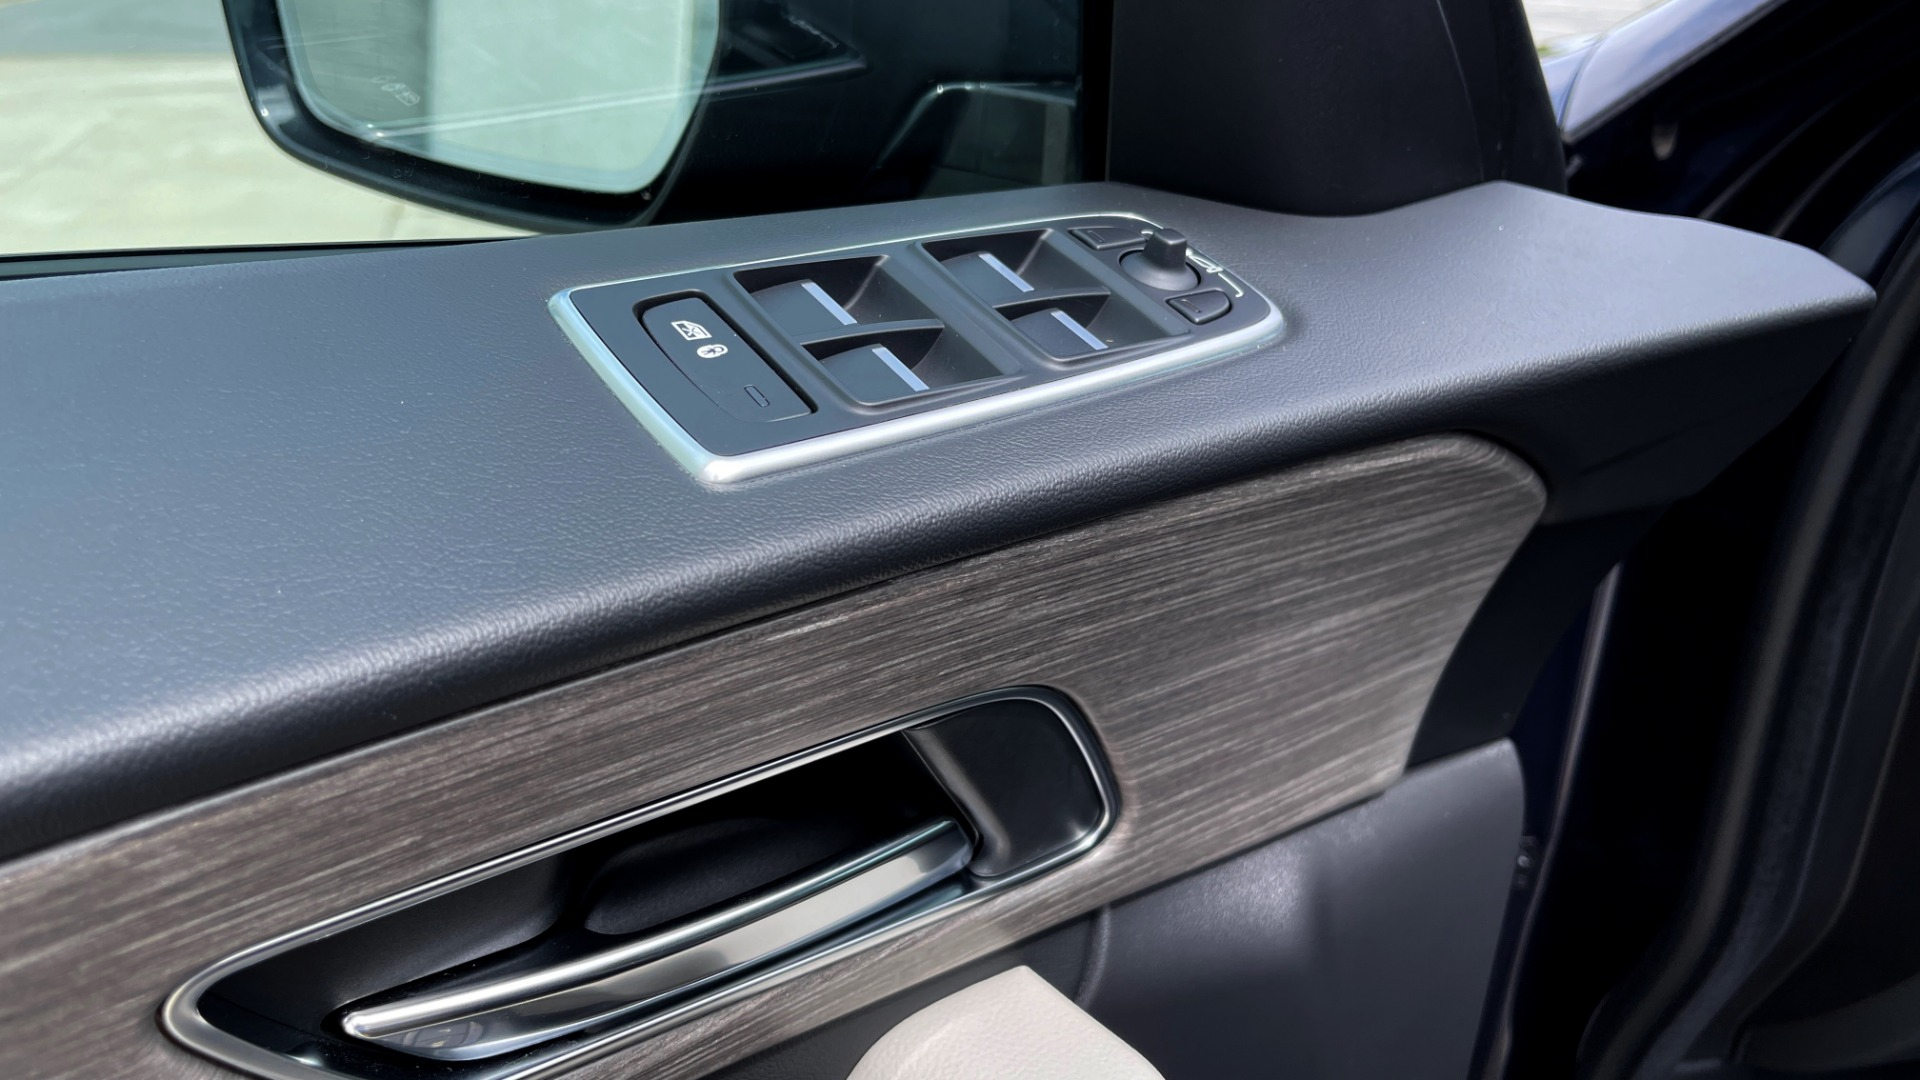 Used 2019 Jaguar F-PACE S / DRIVE PKG / BSA / HUD / BLACK EXT PKG / REARVIEW for sale $50,995 at Formula Imports in Charlotte NC 28227 26